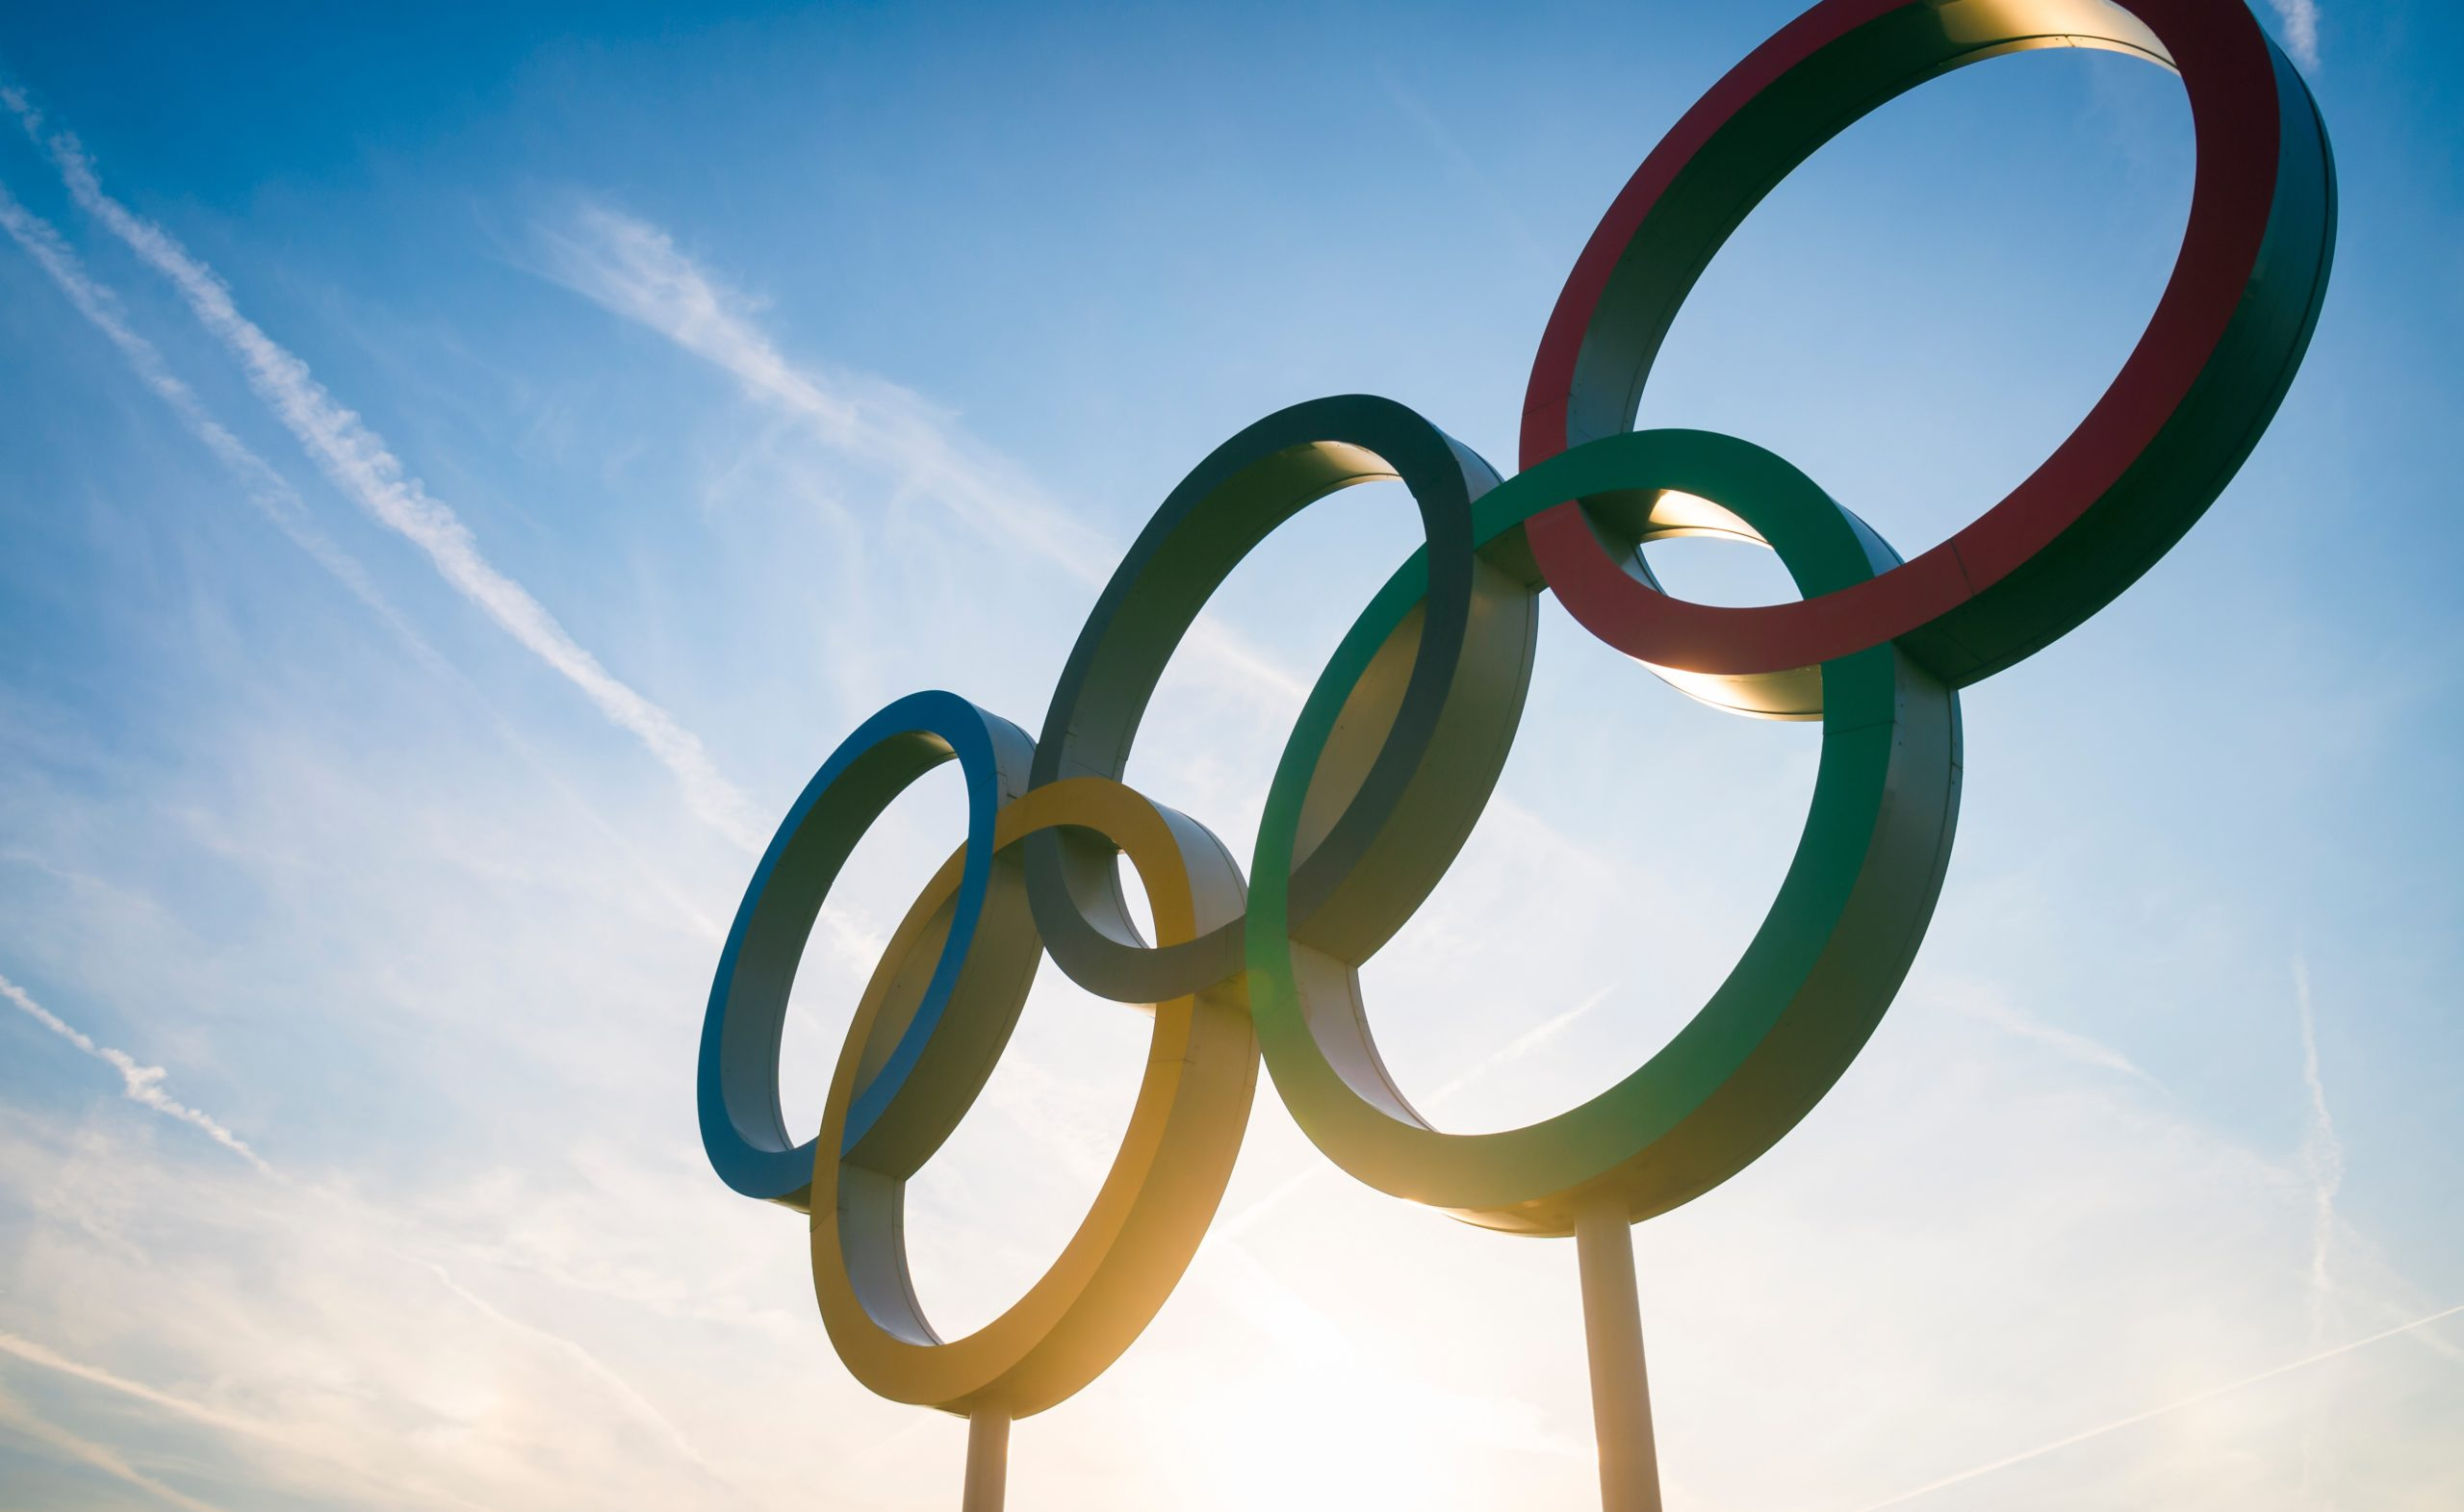 jeux olympiques interview